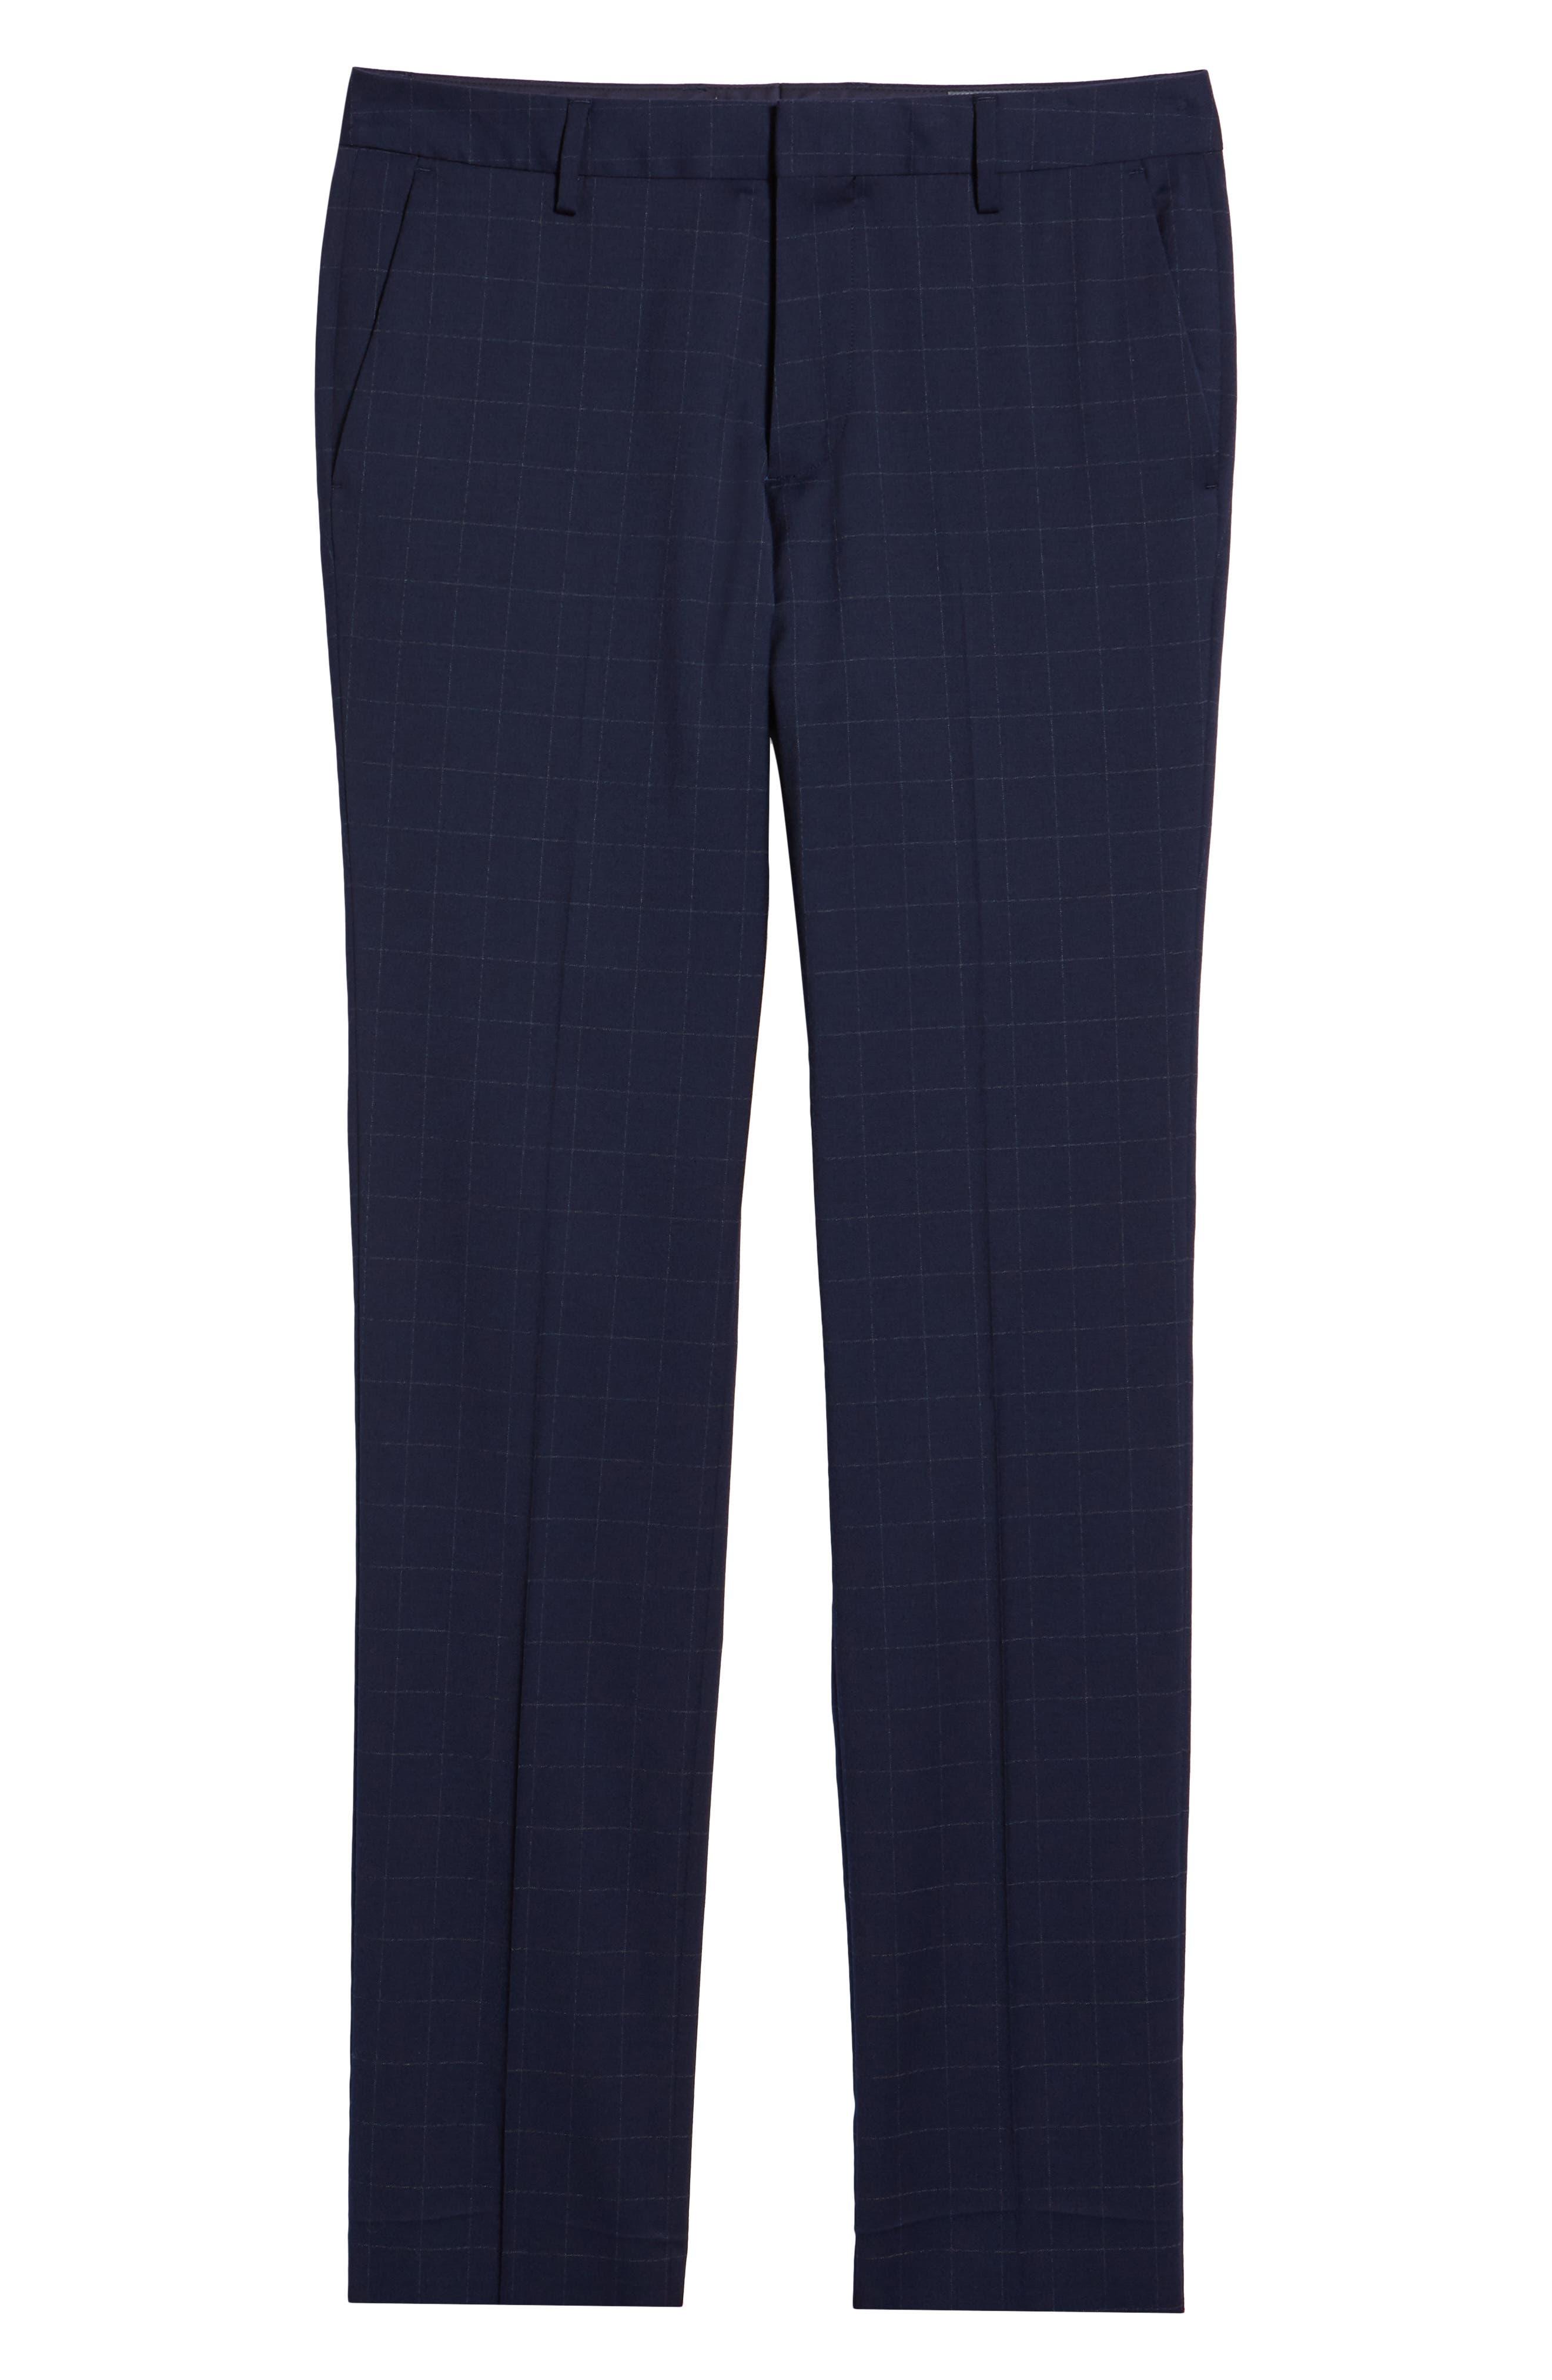 Jetsetter Slim Fit Stretch Suit Pants,                             Alternate thumbnail 6, color,                             NAVY CHALK WINDOWPANE